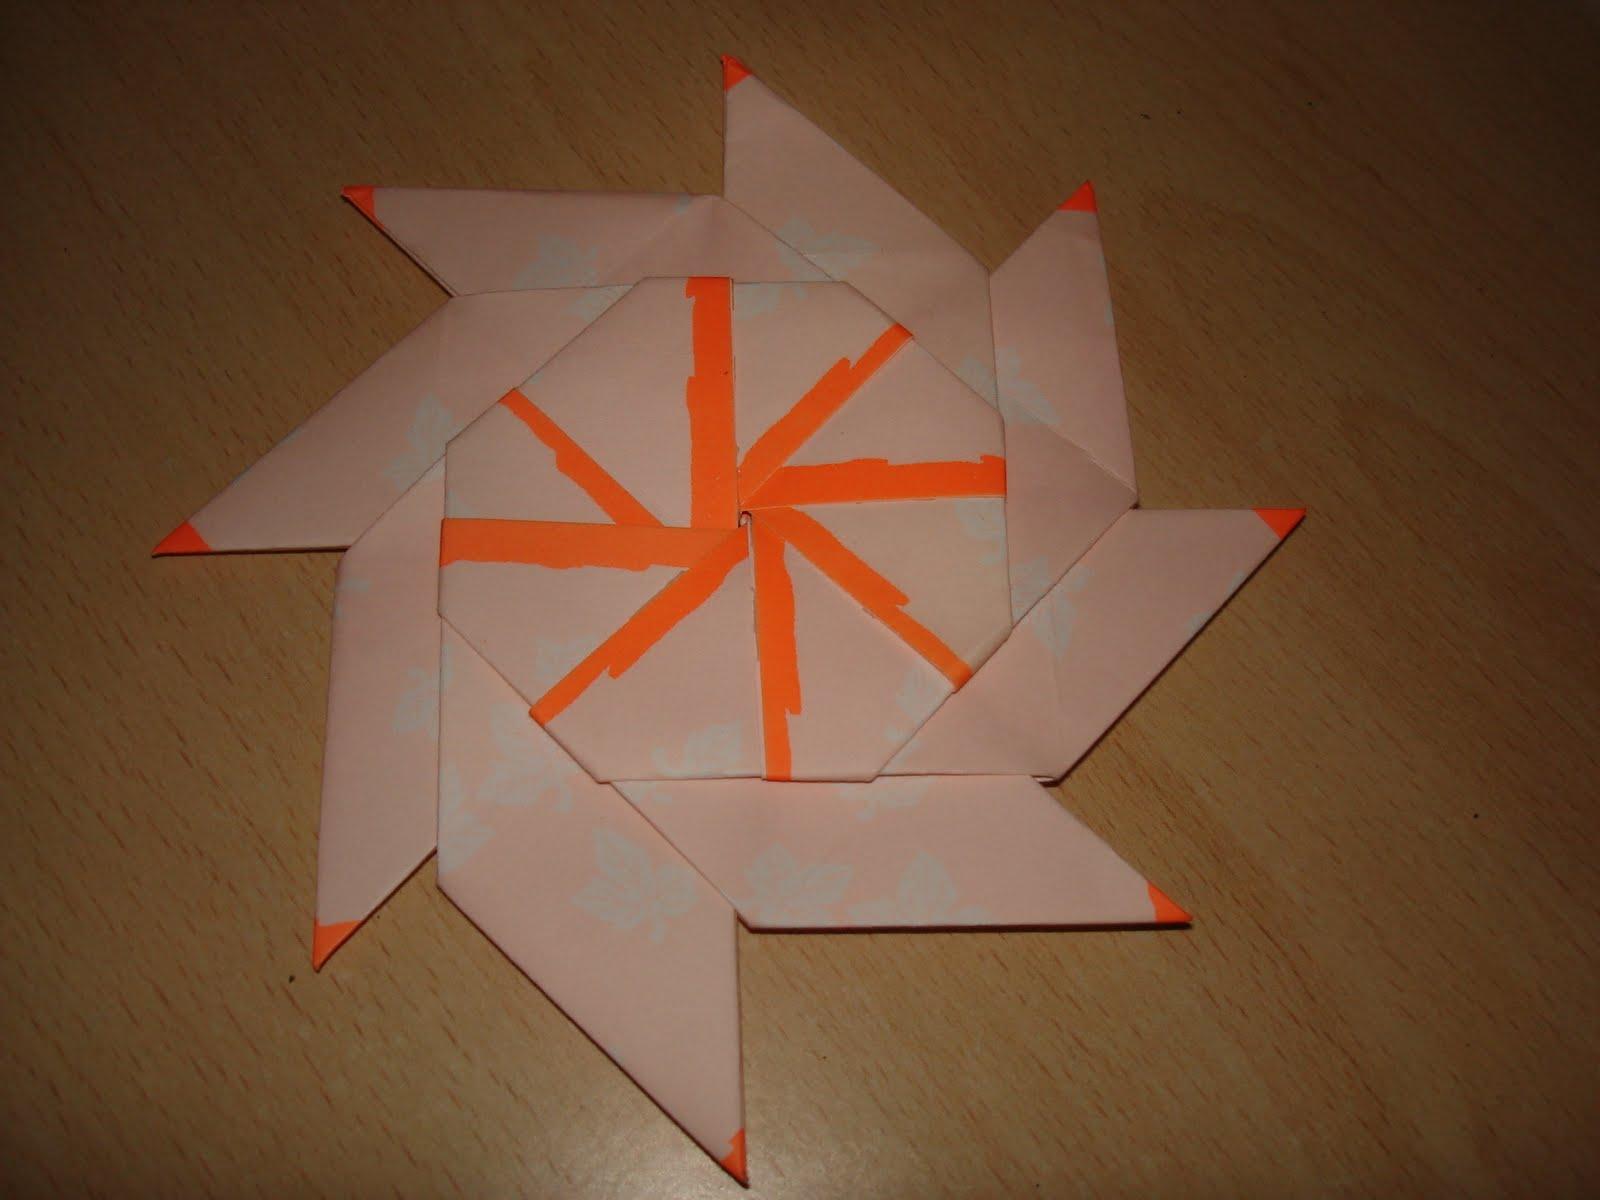 Origami Symmetrical Shuriken Star Tutorial - Paper Kawaii | 1200x1600